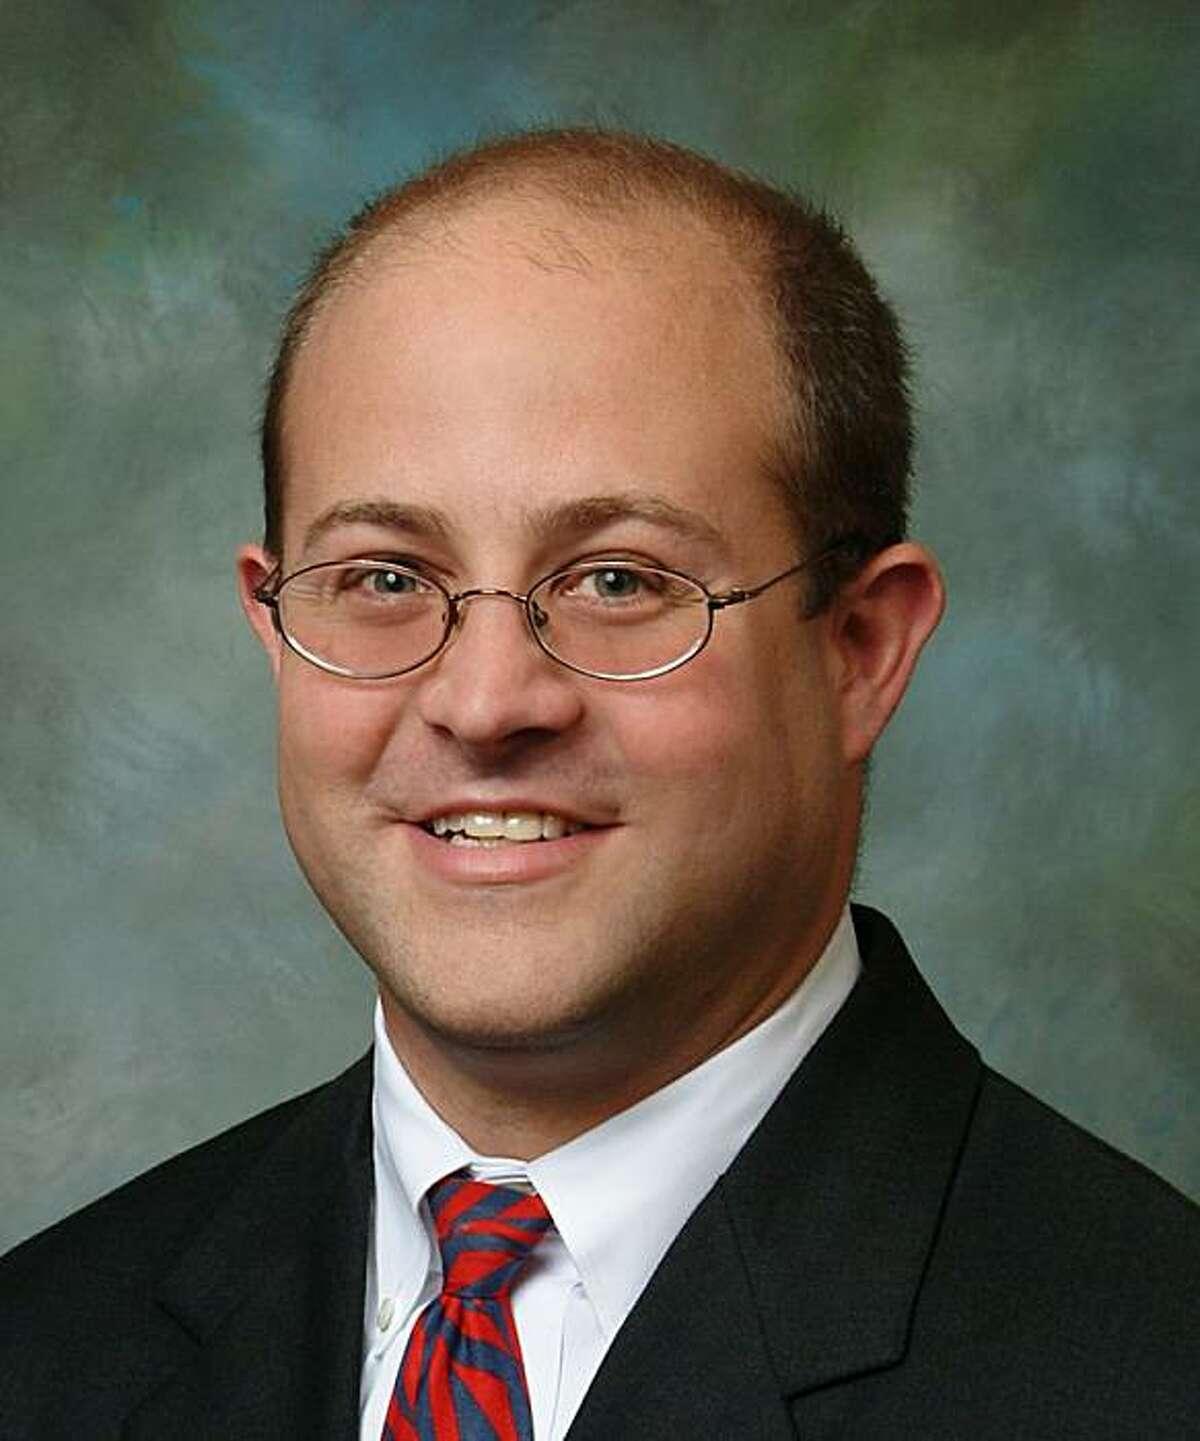 Richard Kline, a partner at Wilson Sonsini.